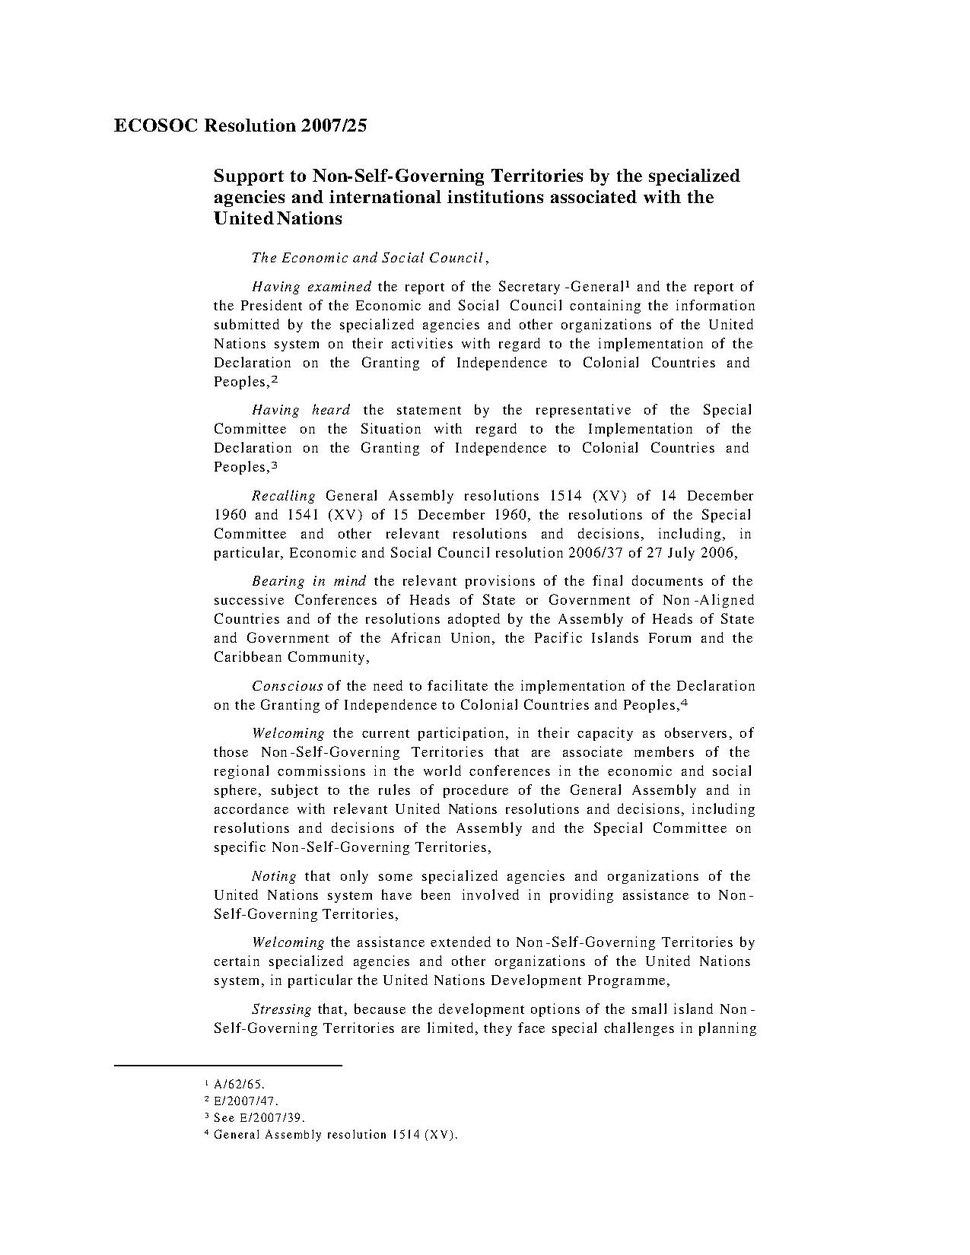 Economic and Social Council Resolution 2007-25.pdf